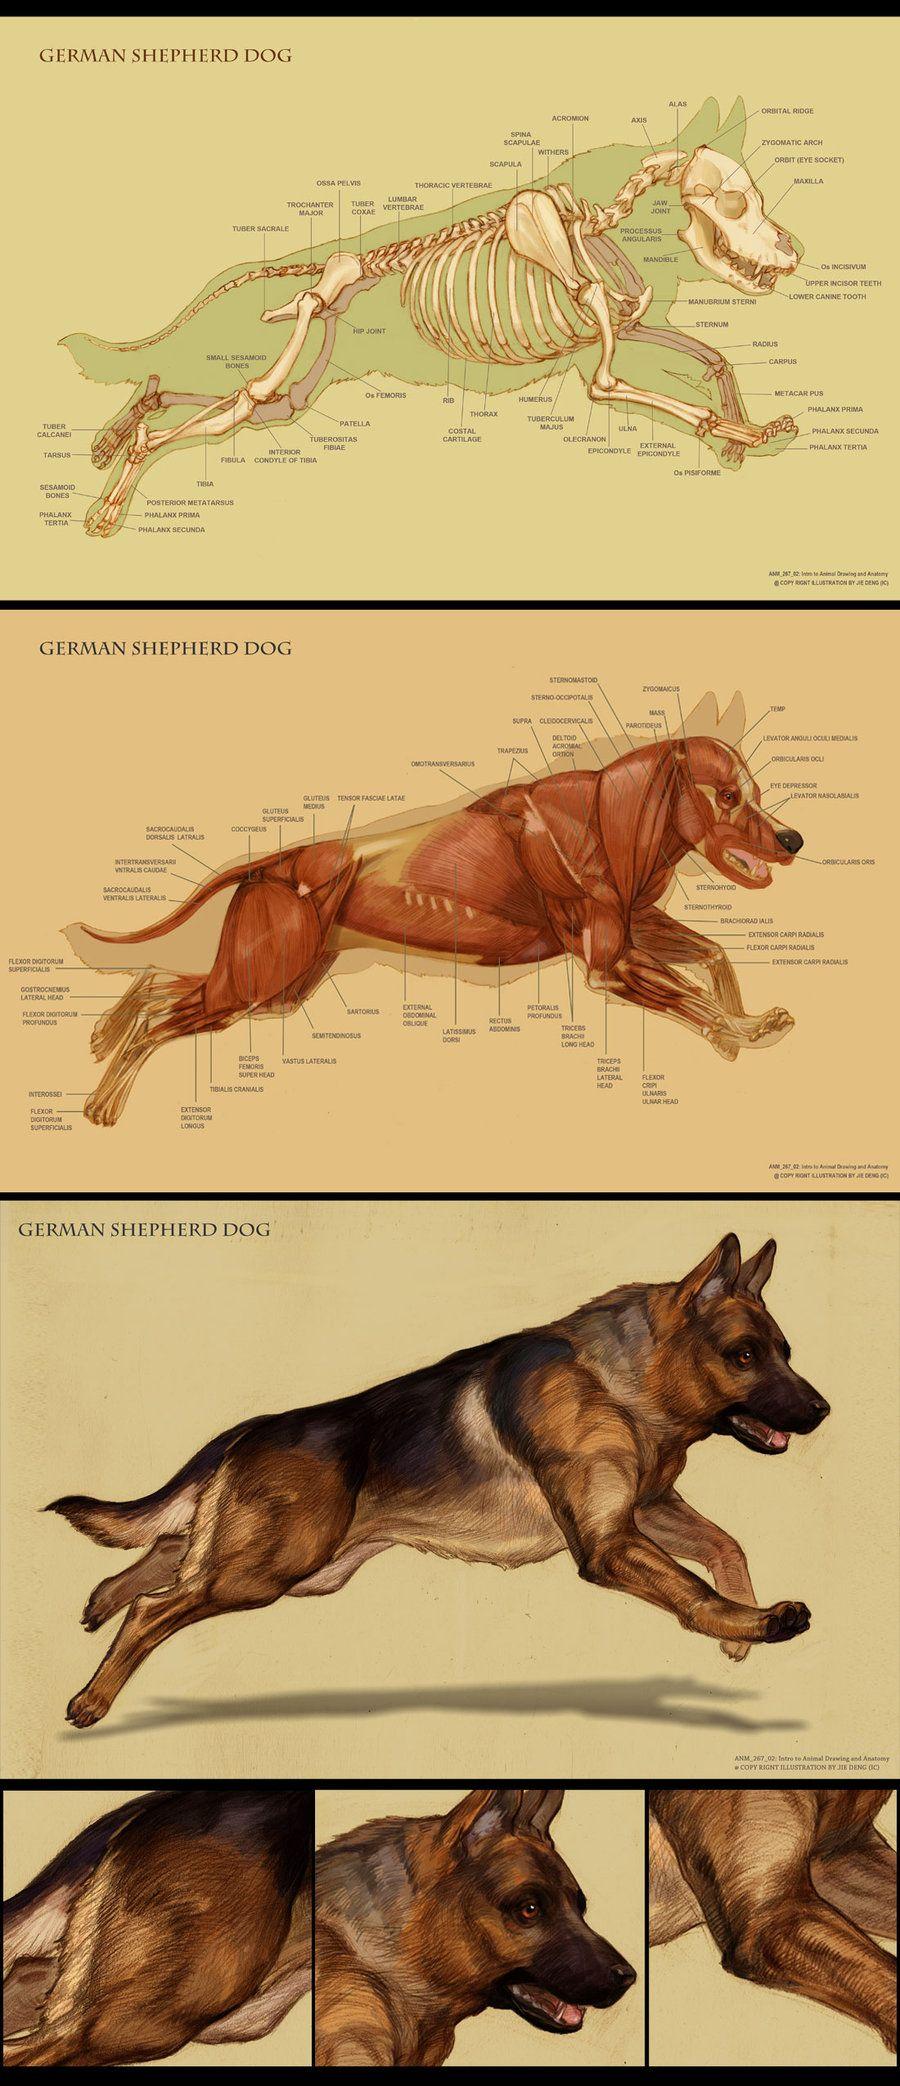 Dog anatomy by IC-ICO | animal anatomy | Pinterest | Dog anatomy ...